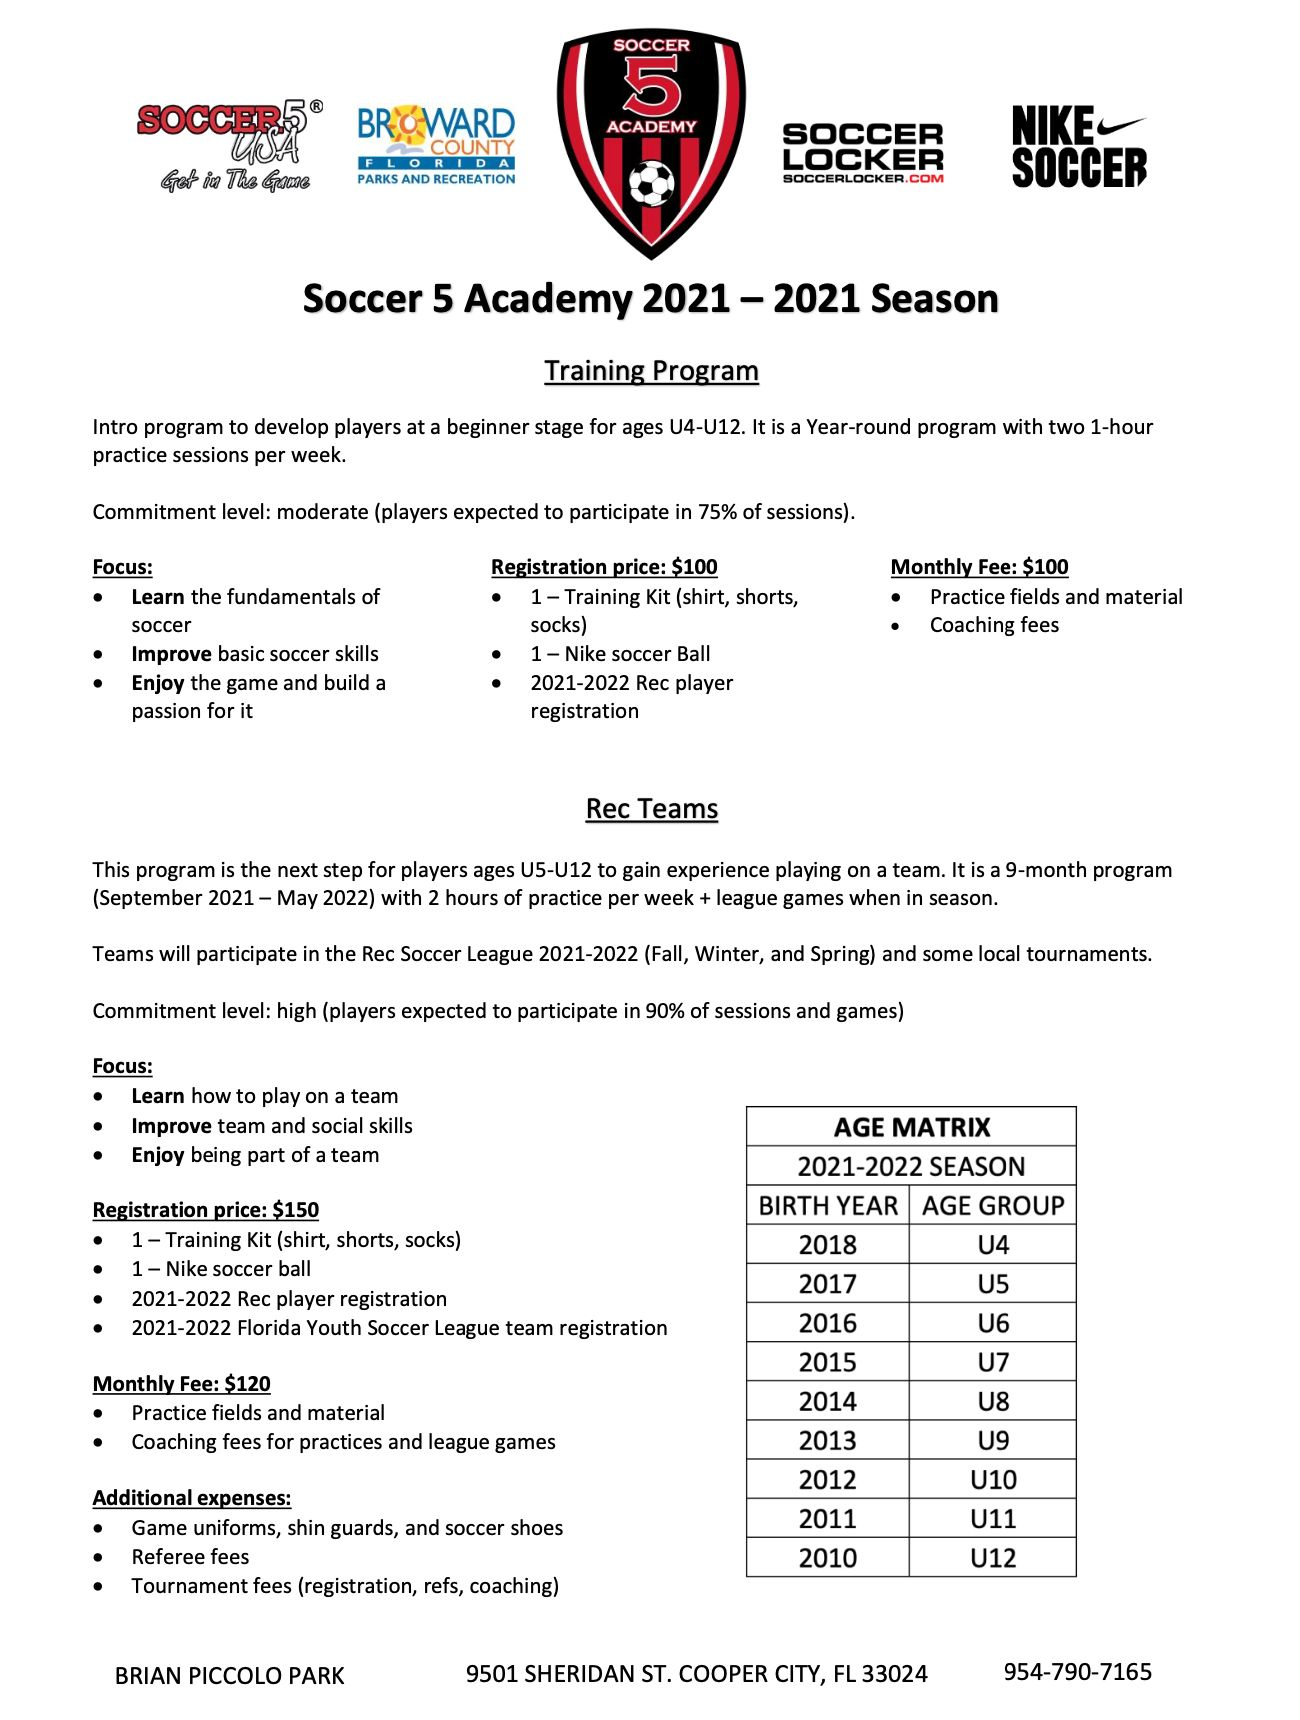 Soccer 5 Brian Piccolo Park Broward Academy 2021-2022 Season Details Part 1